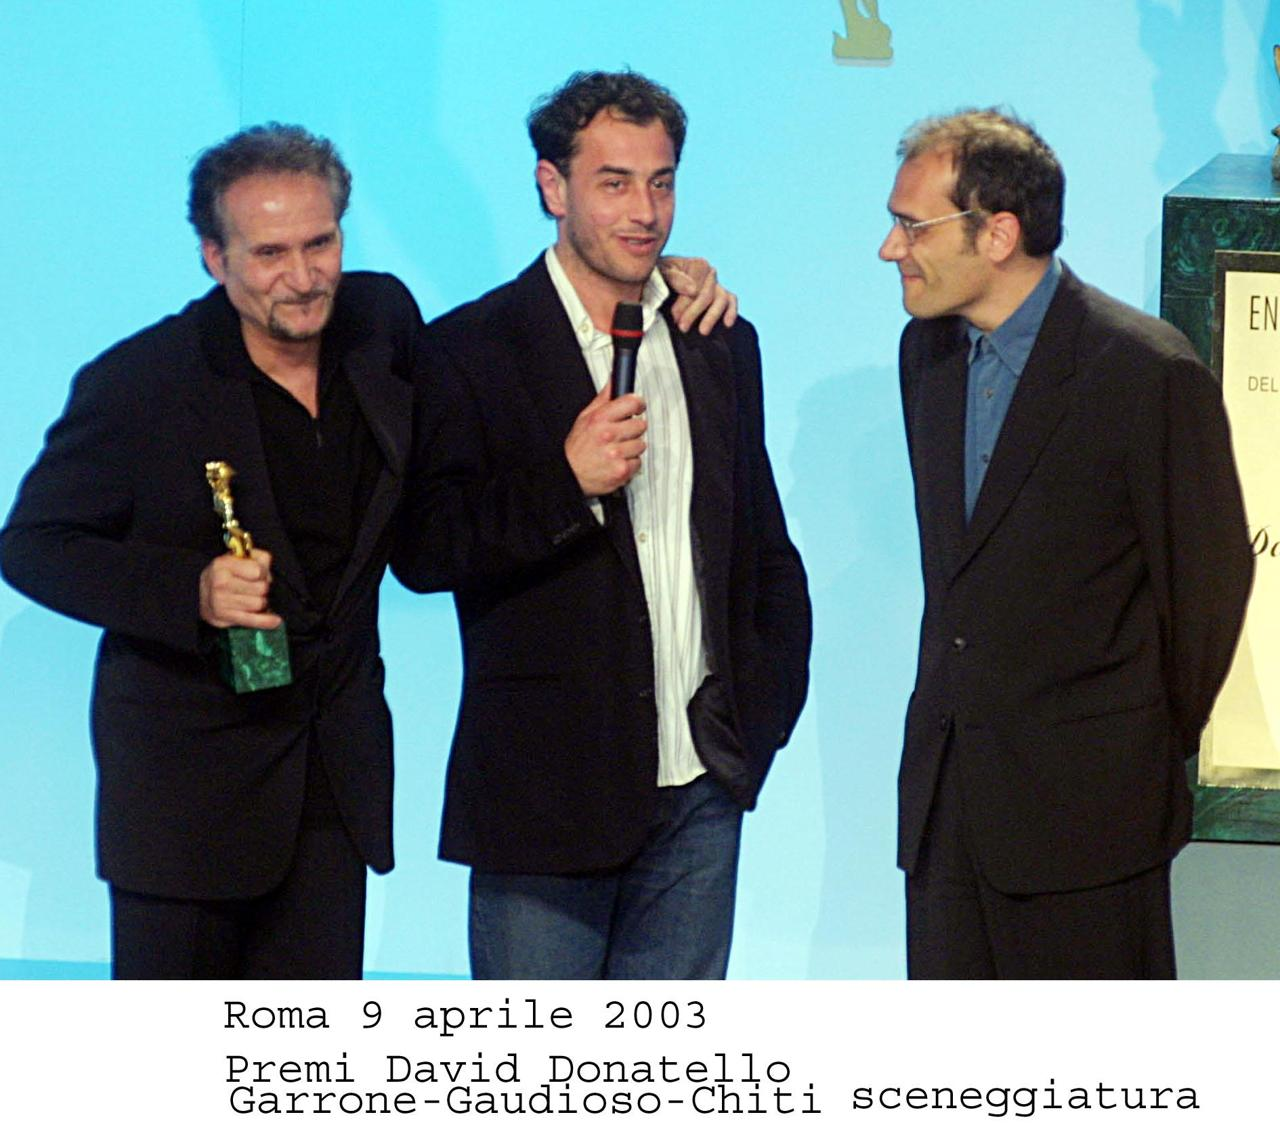 Matteo Garrone e Massimo Gaudioso